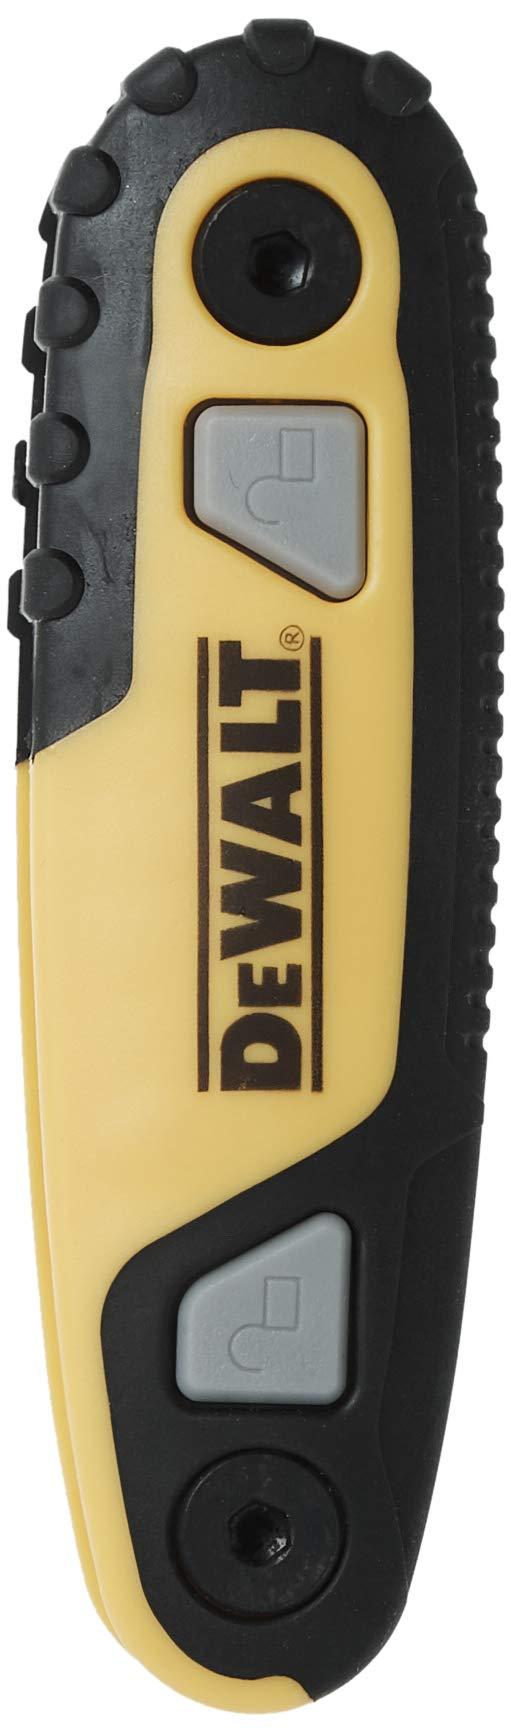 DEWALT Hex Key Set, SAE, Folding/Locking, 8 Keys (DWHT70262M)